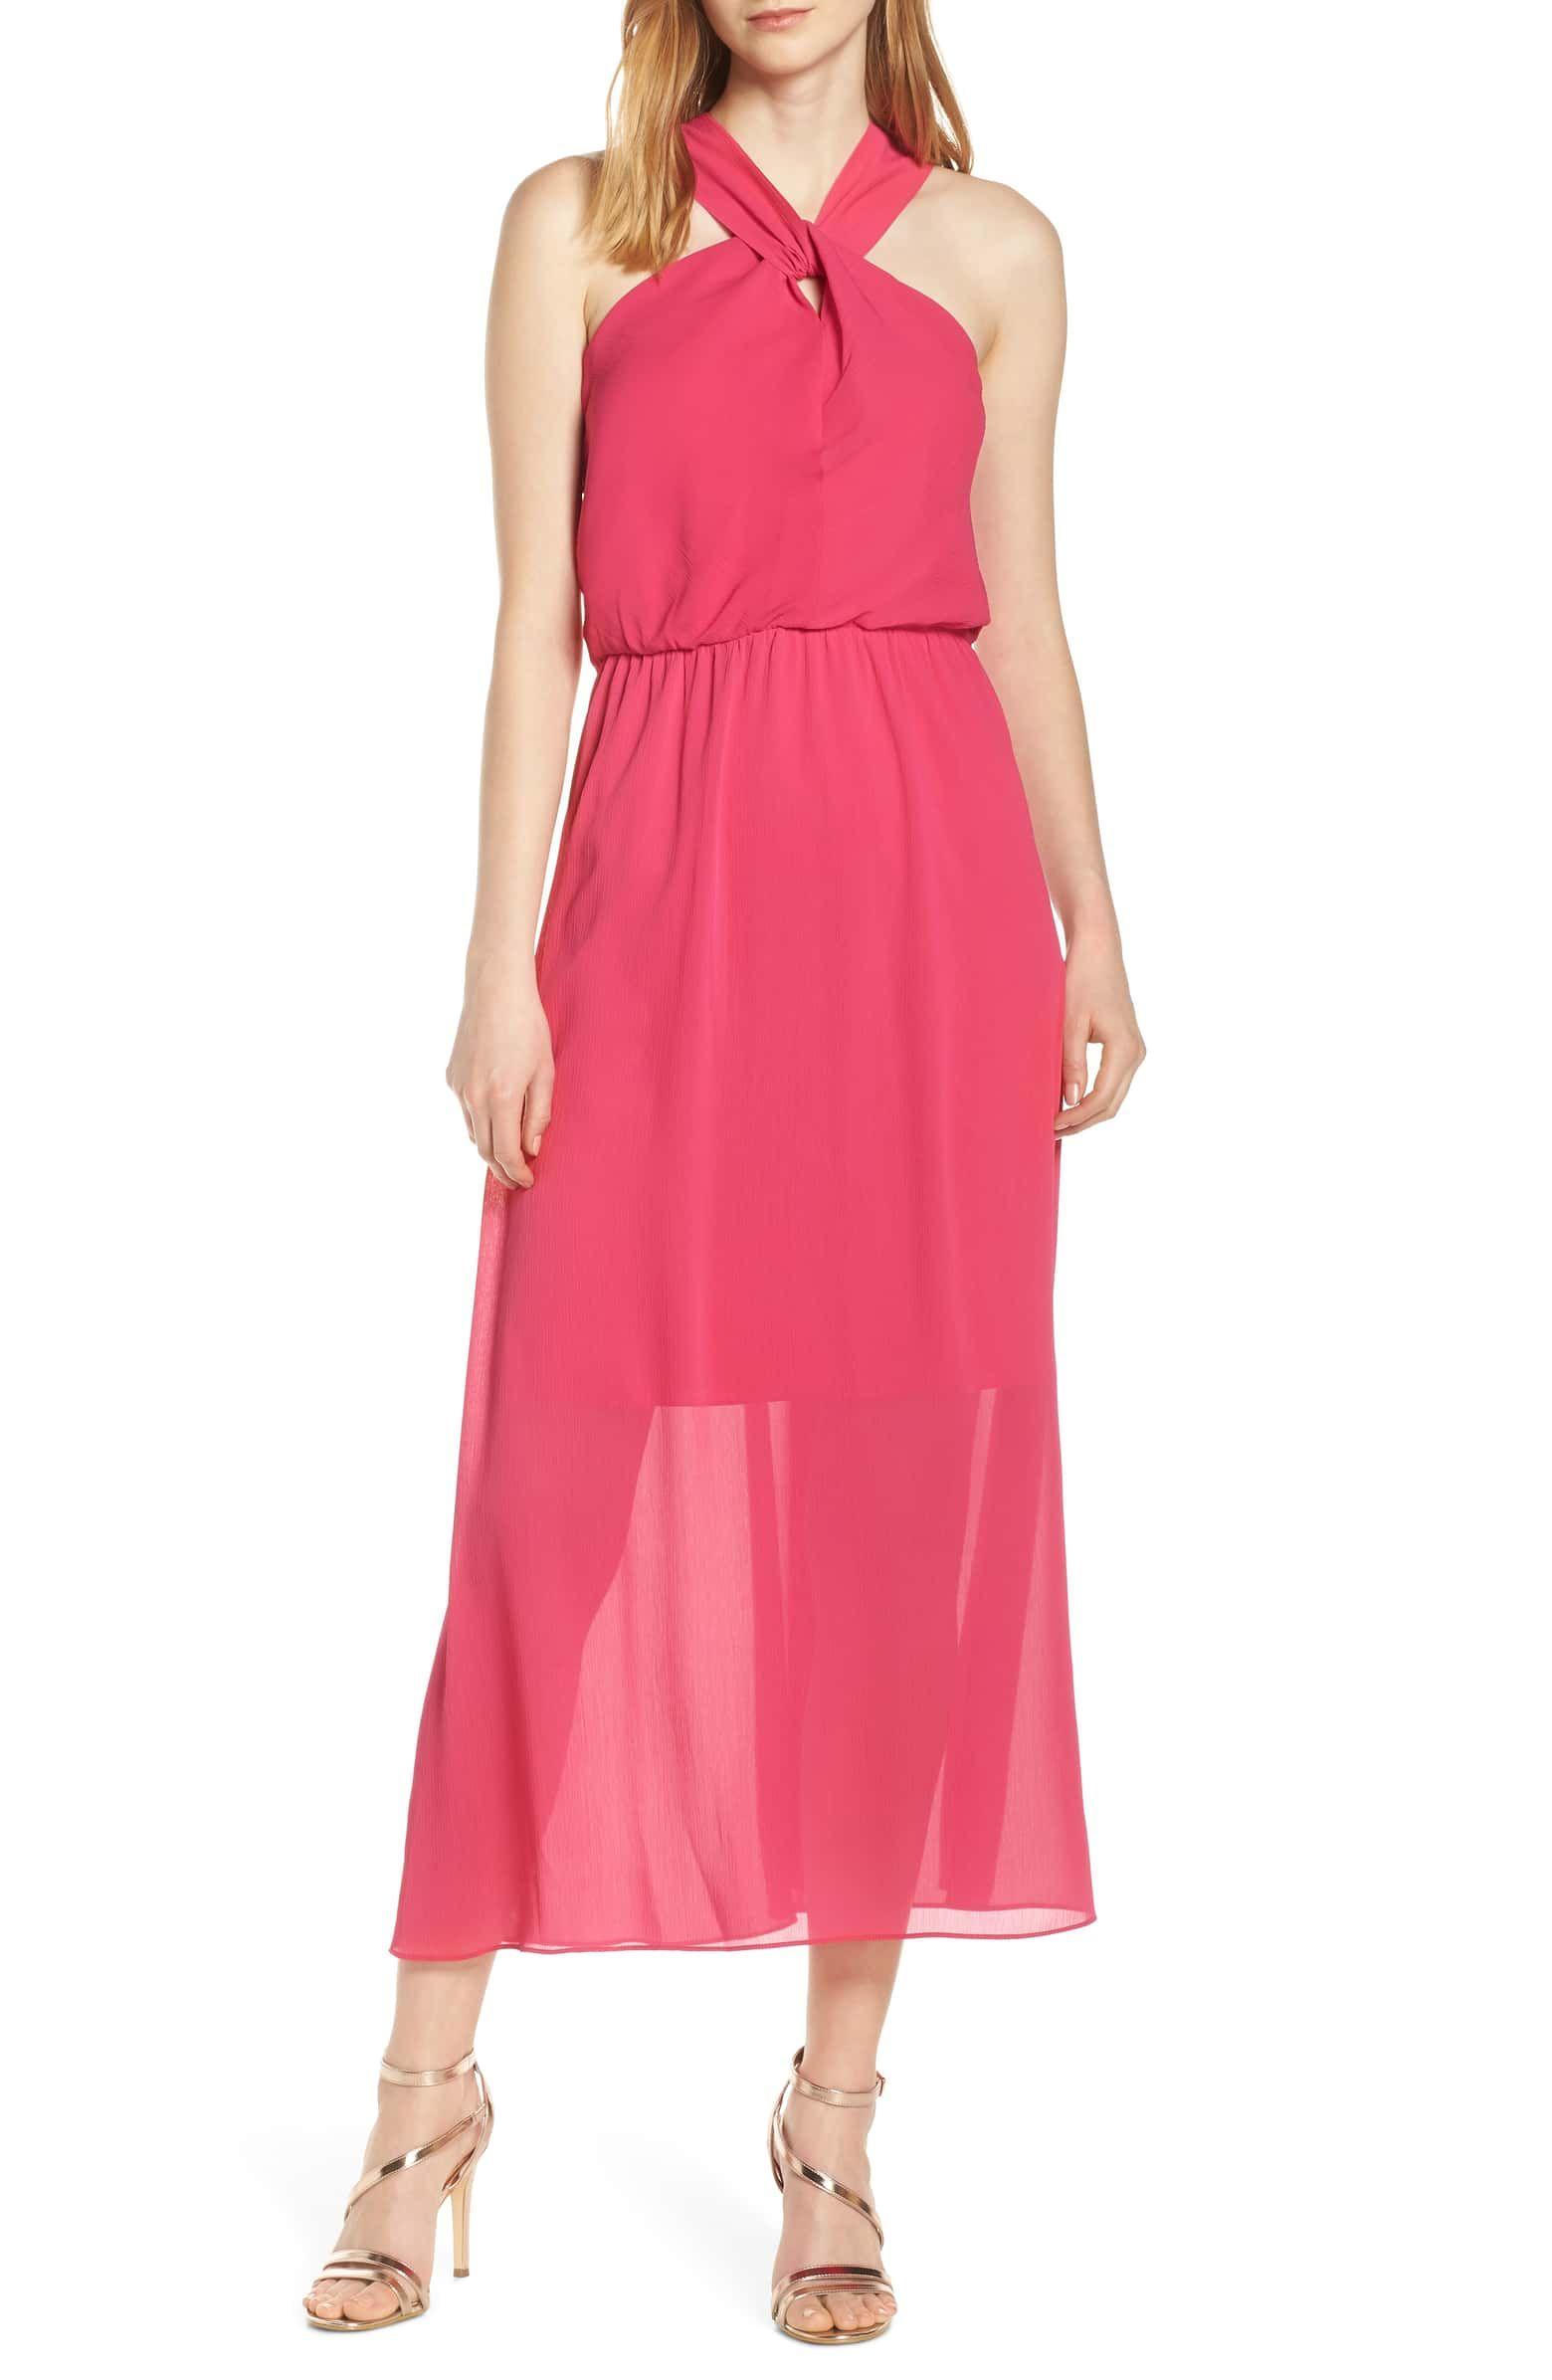 Criss Cross Halter Neck Maxi Dress Fashion Clothes Women Maxi Dress Maxi Dress Online